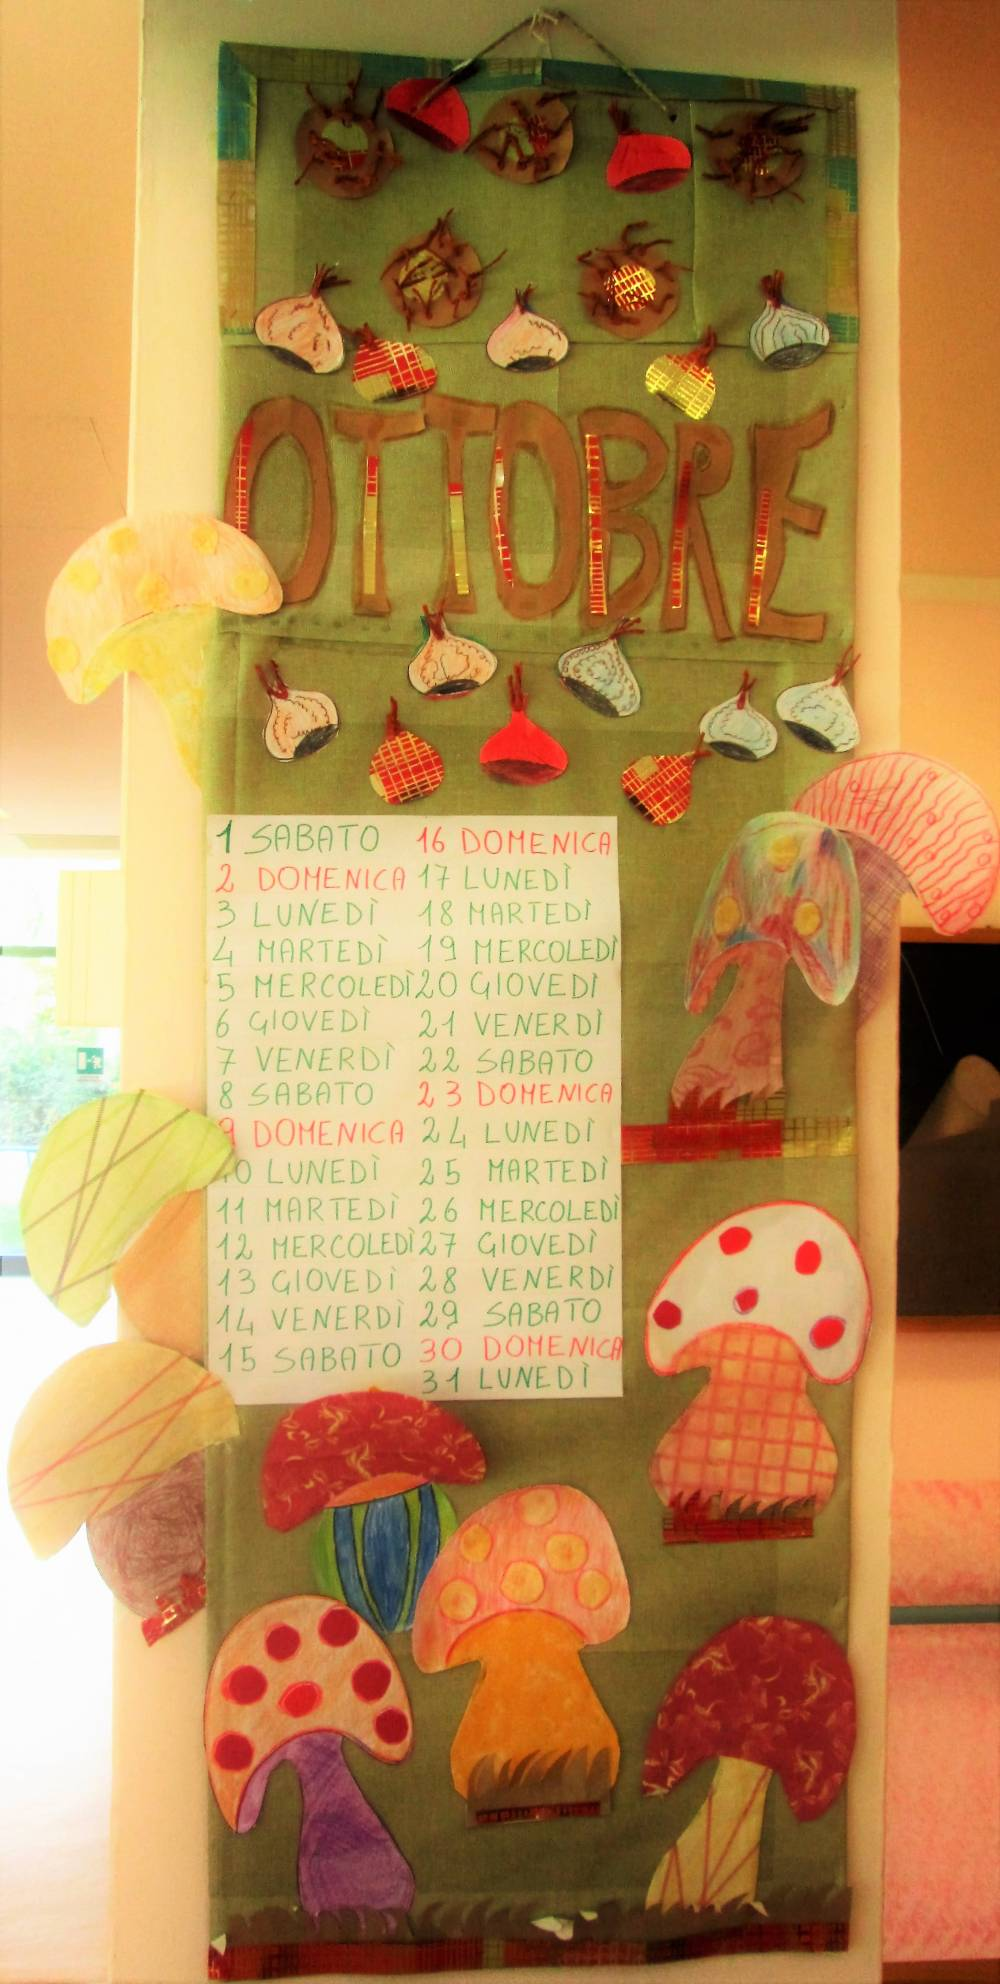 Calendario Funghi.Ottobre Funghi E Castagne E Calendario